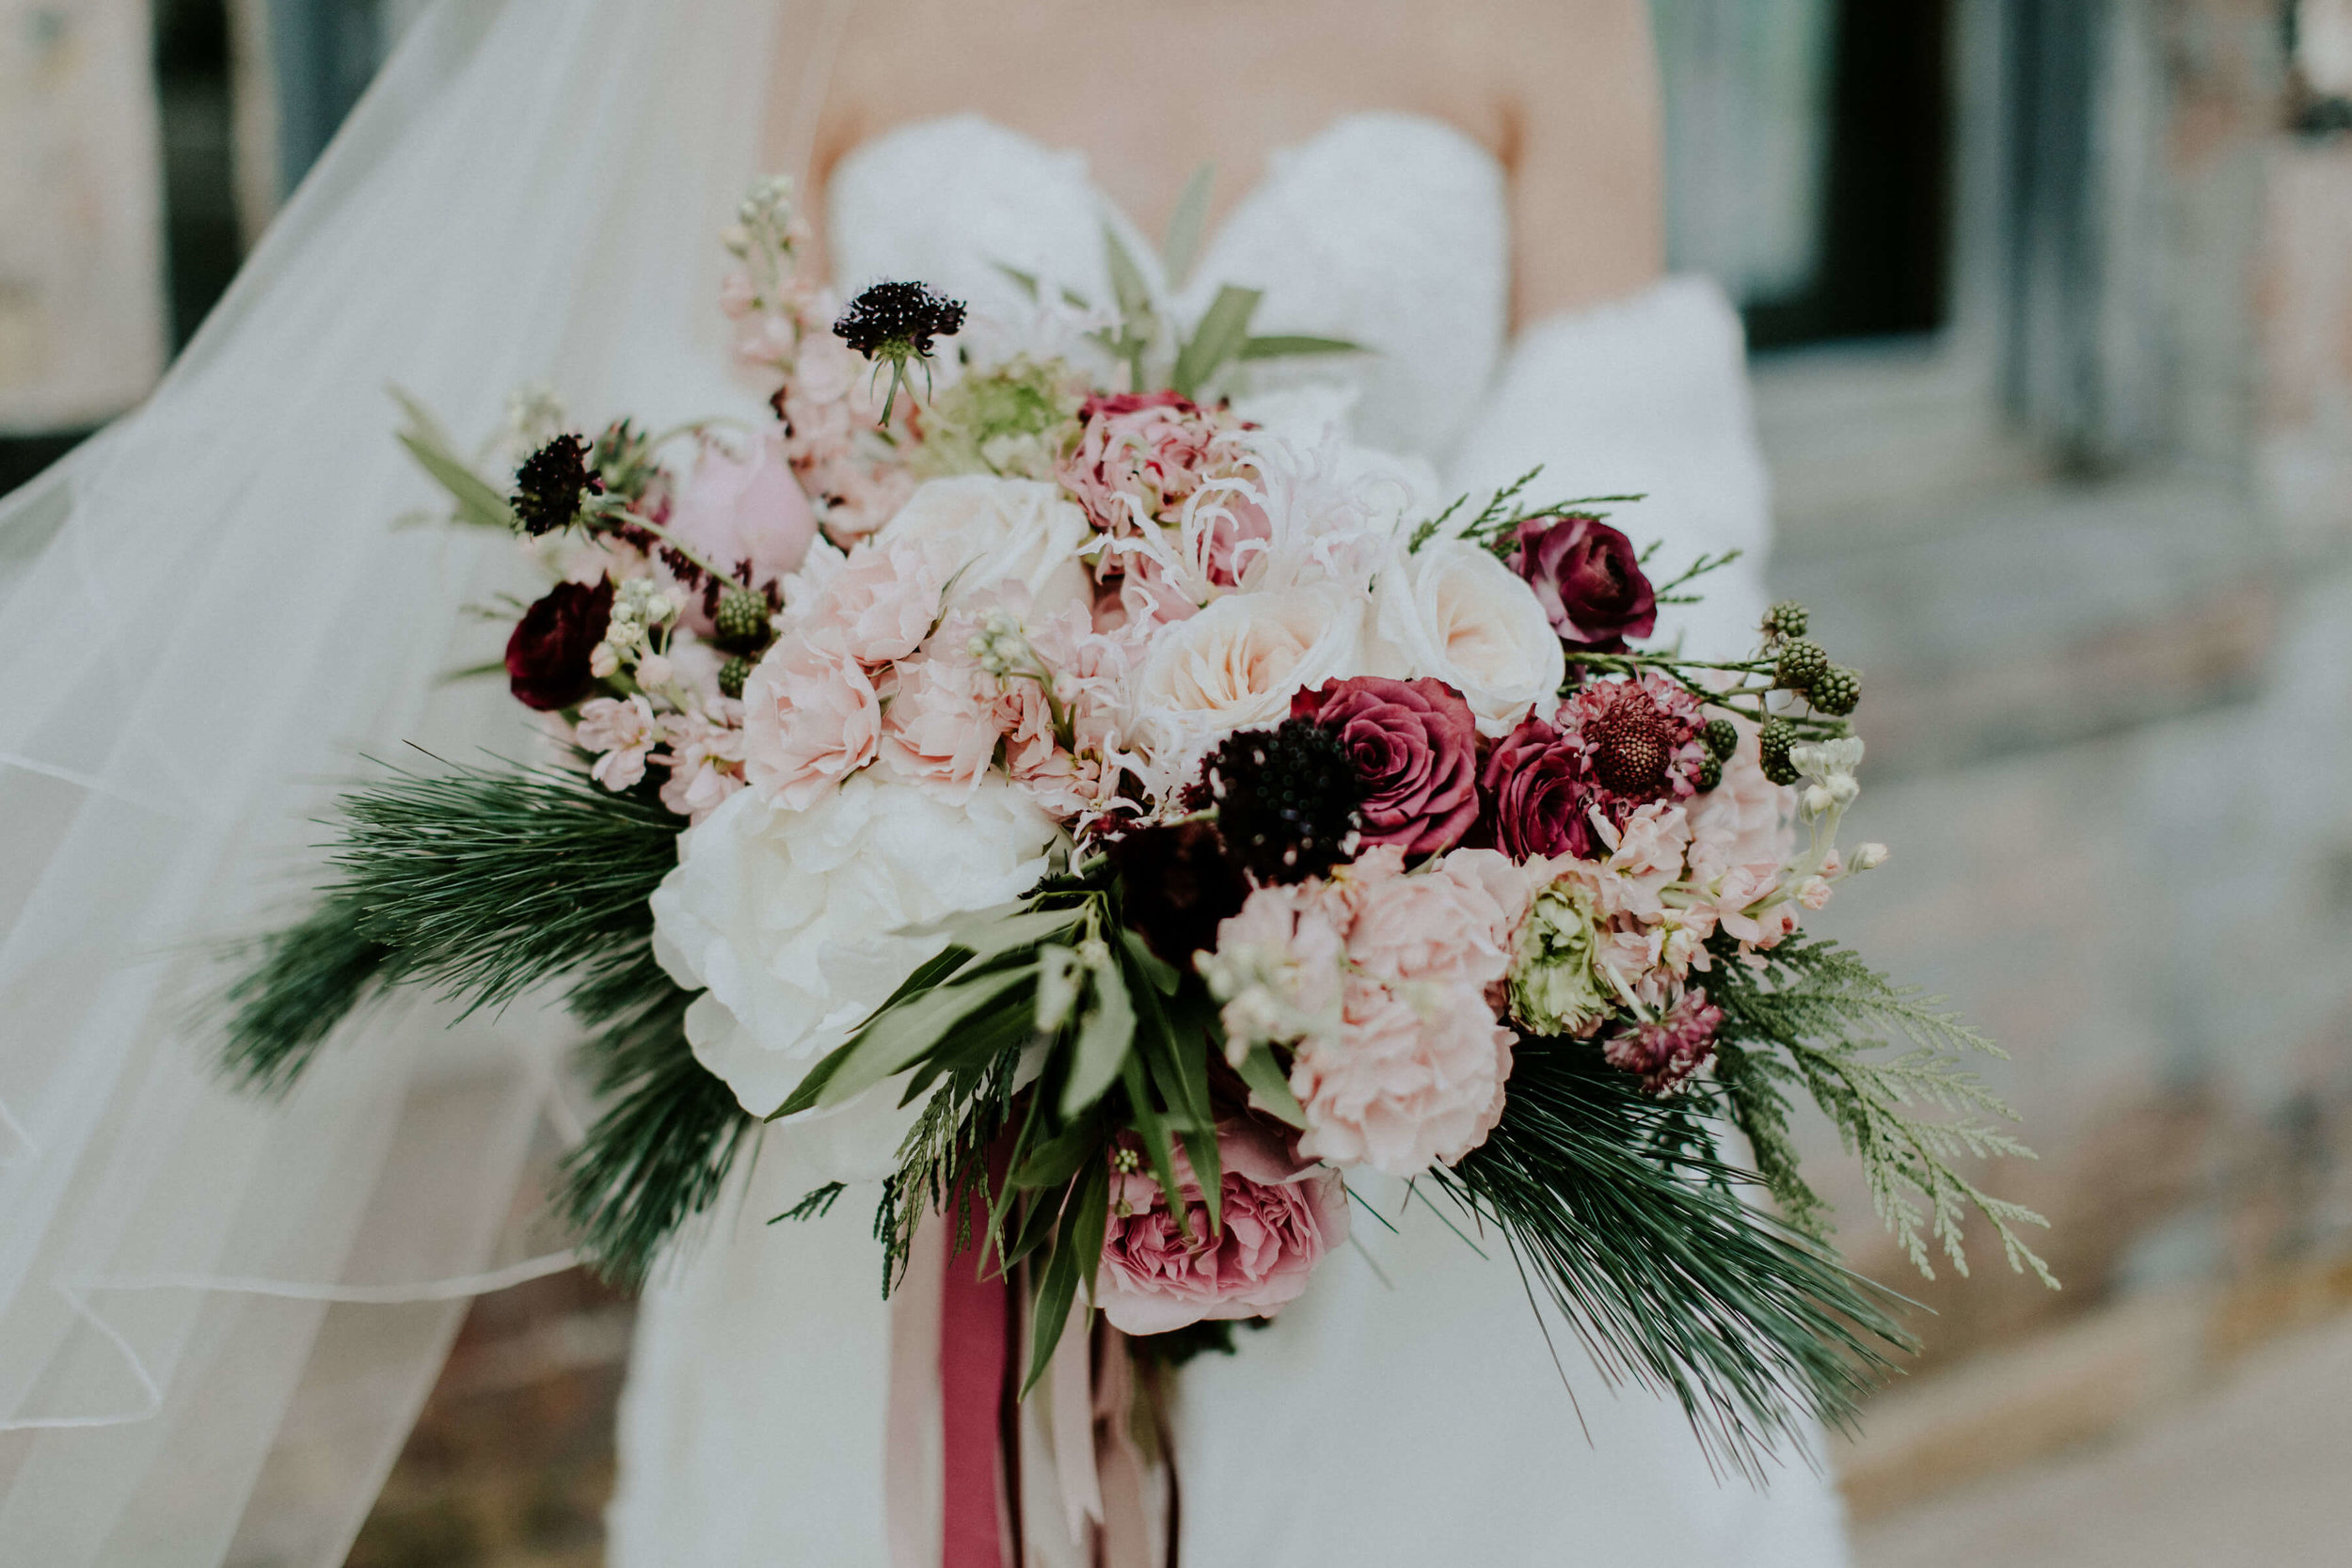 Kim+Greg_Jordan_Wedding_Aria_Russell_Heeter_Photography-165.jpg